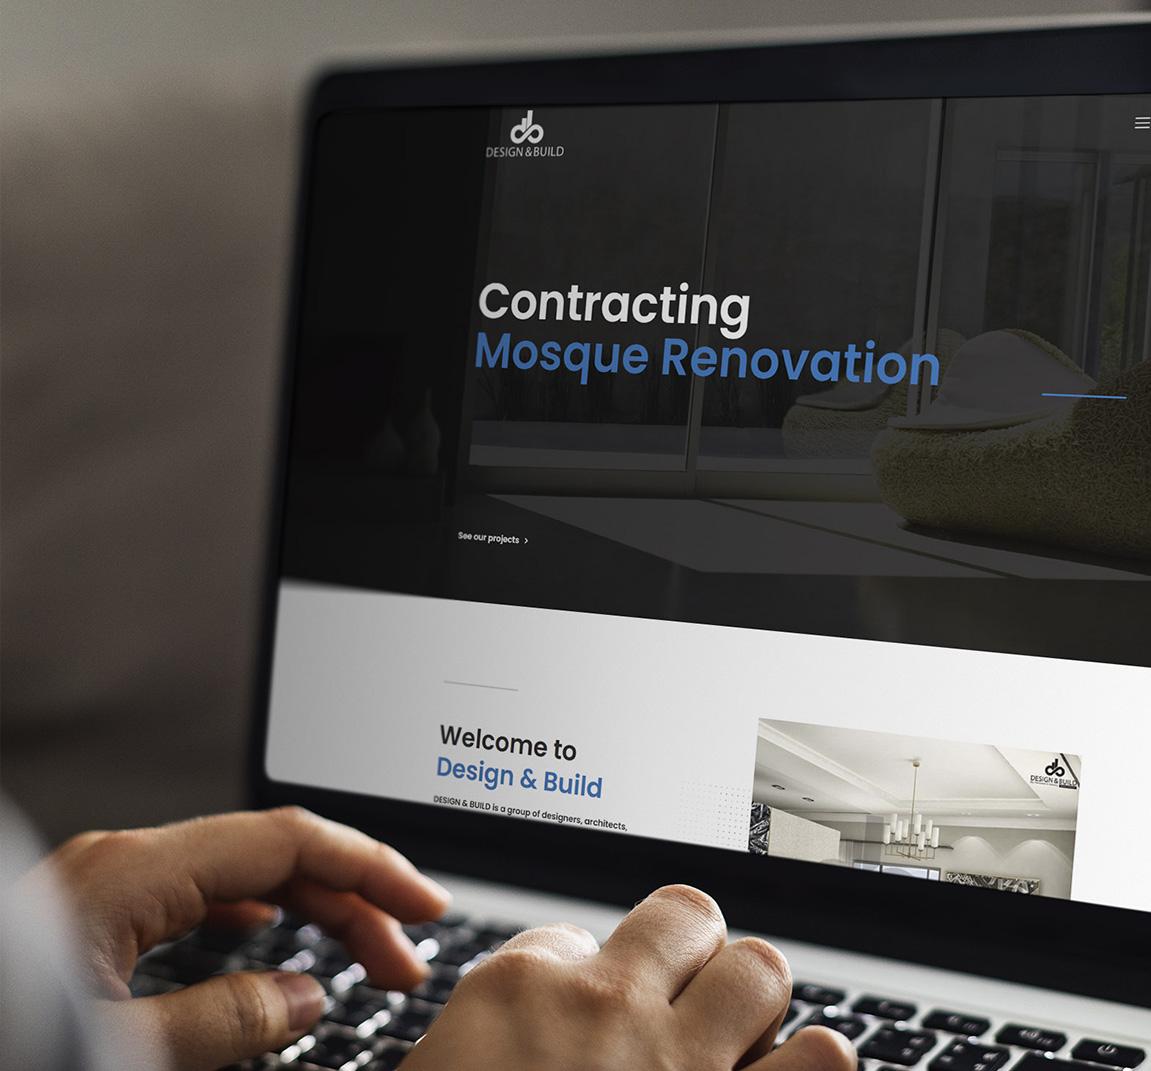 Alex Web Design, website development and mobile app development company clients in Egypt - Design & Build